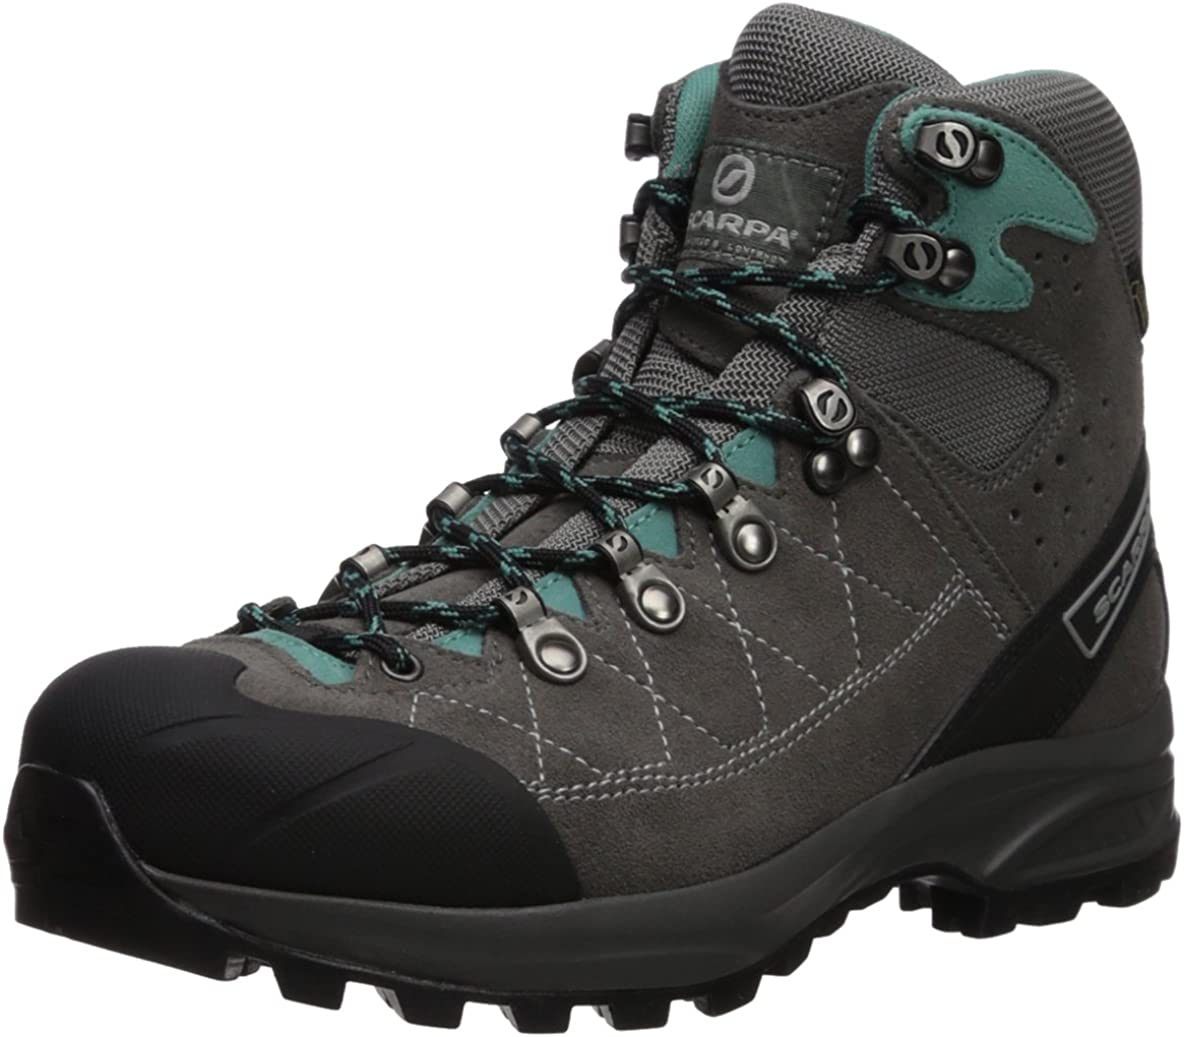 SCARPA Women's Kailash Trek GTX Hiking Boot